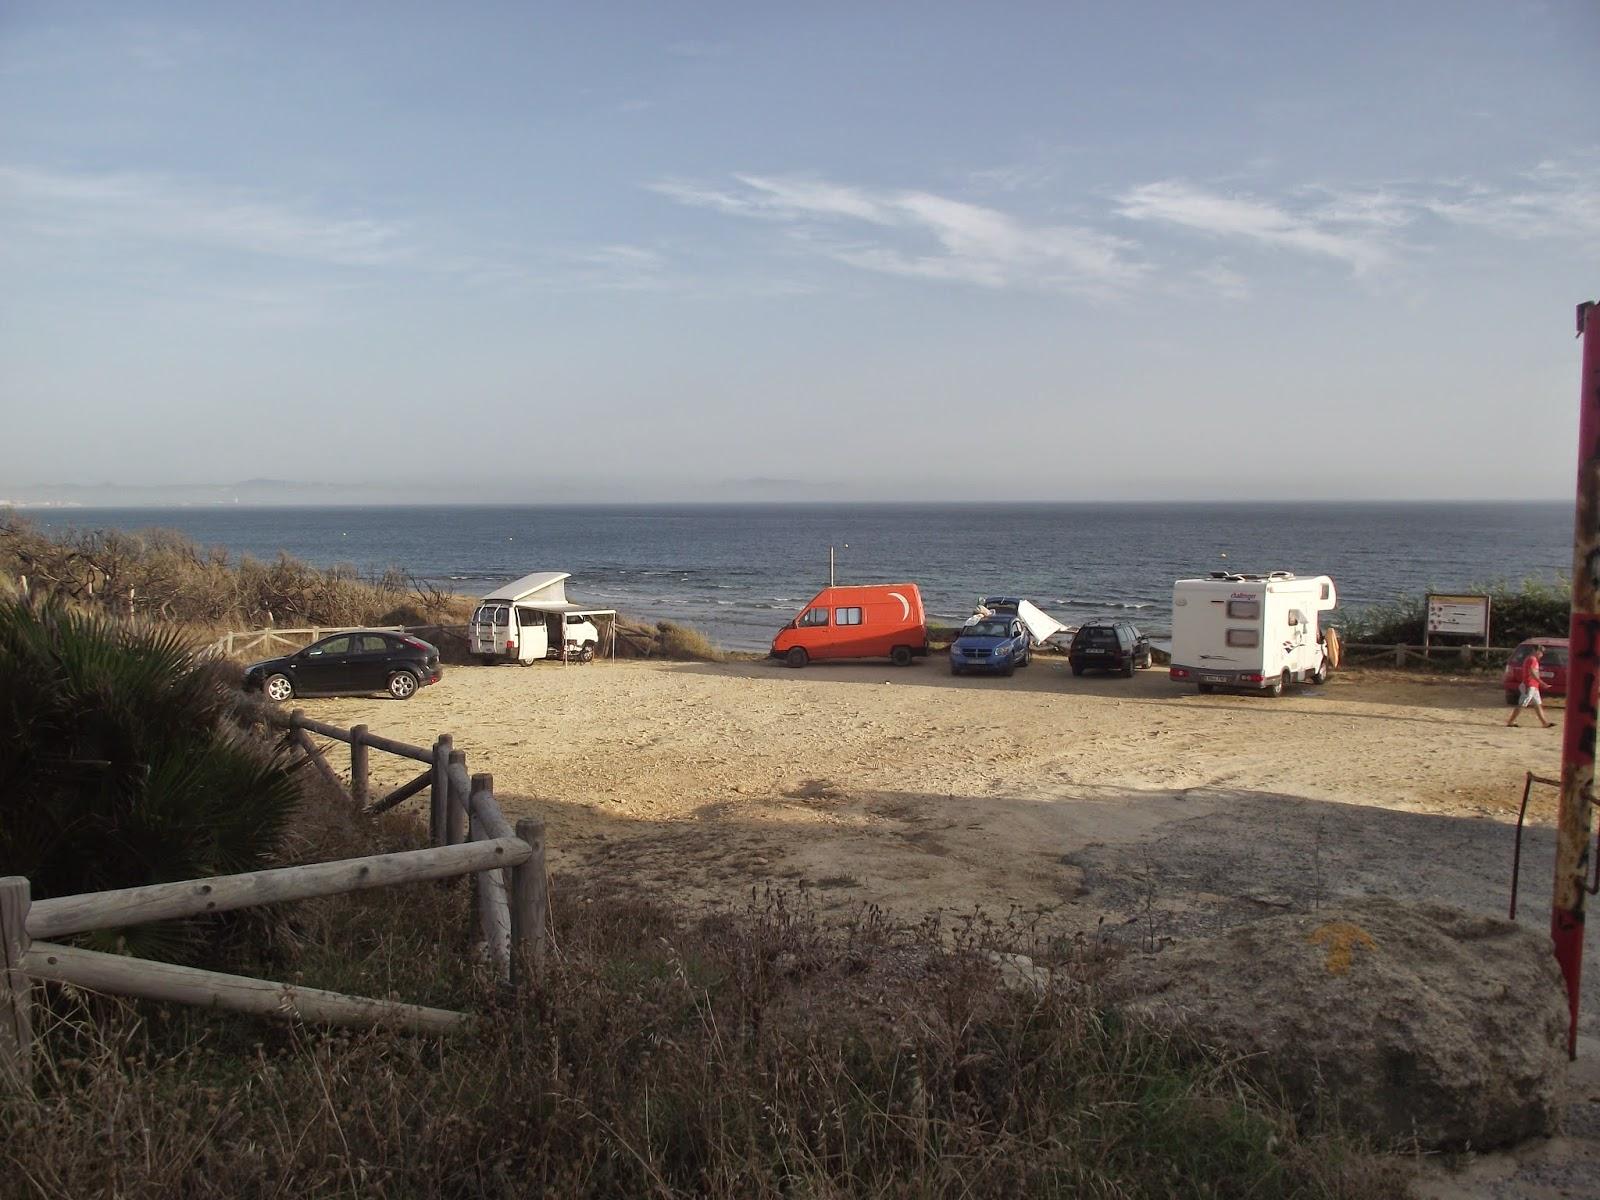 Playa Playa de Punta Prieta